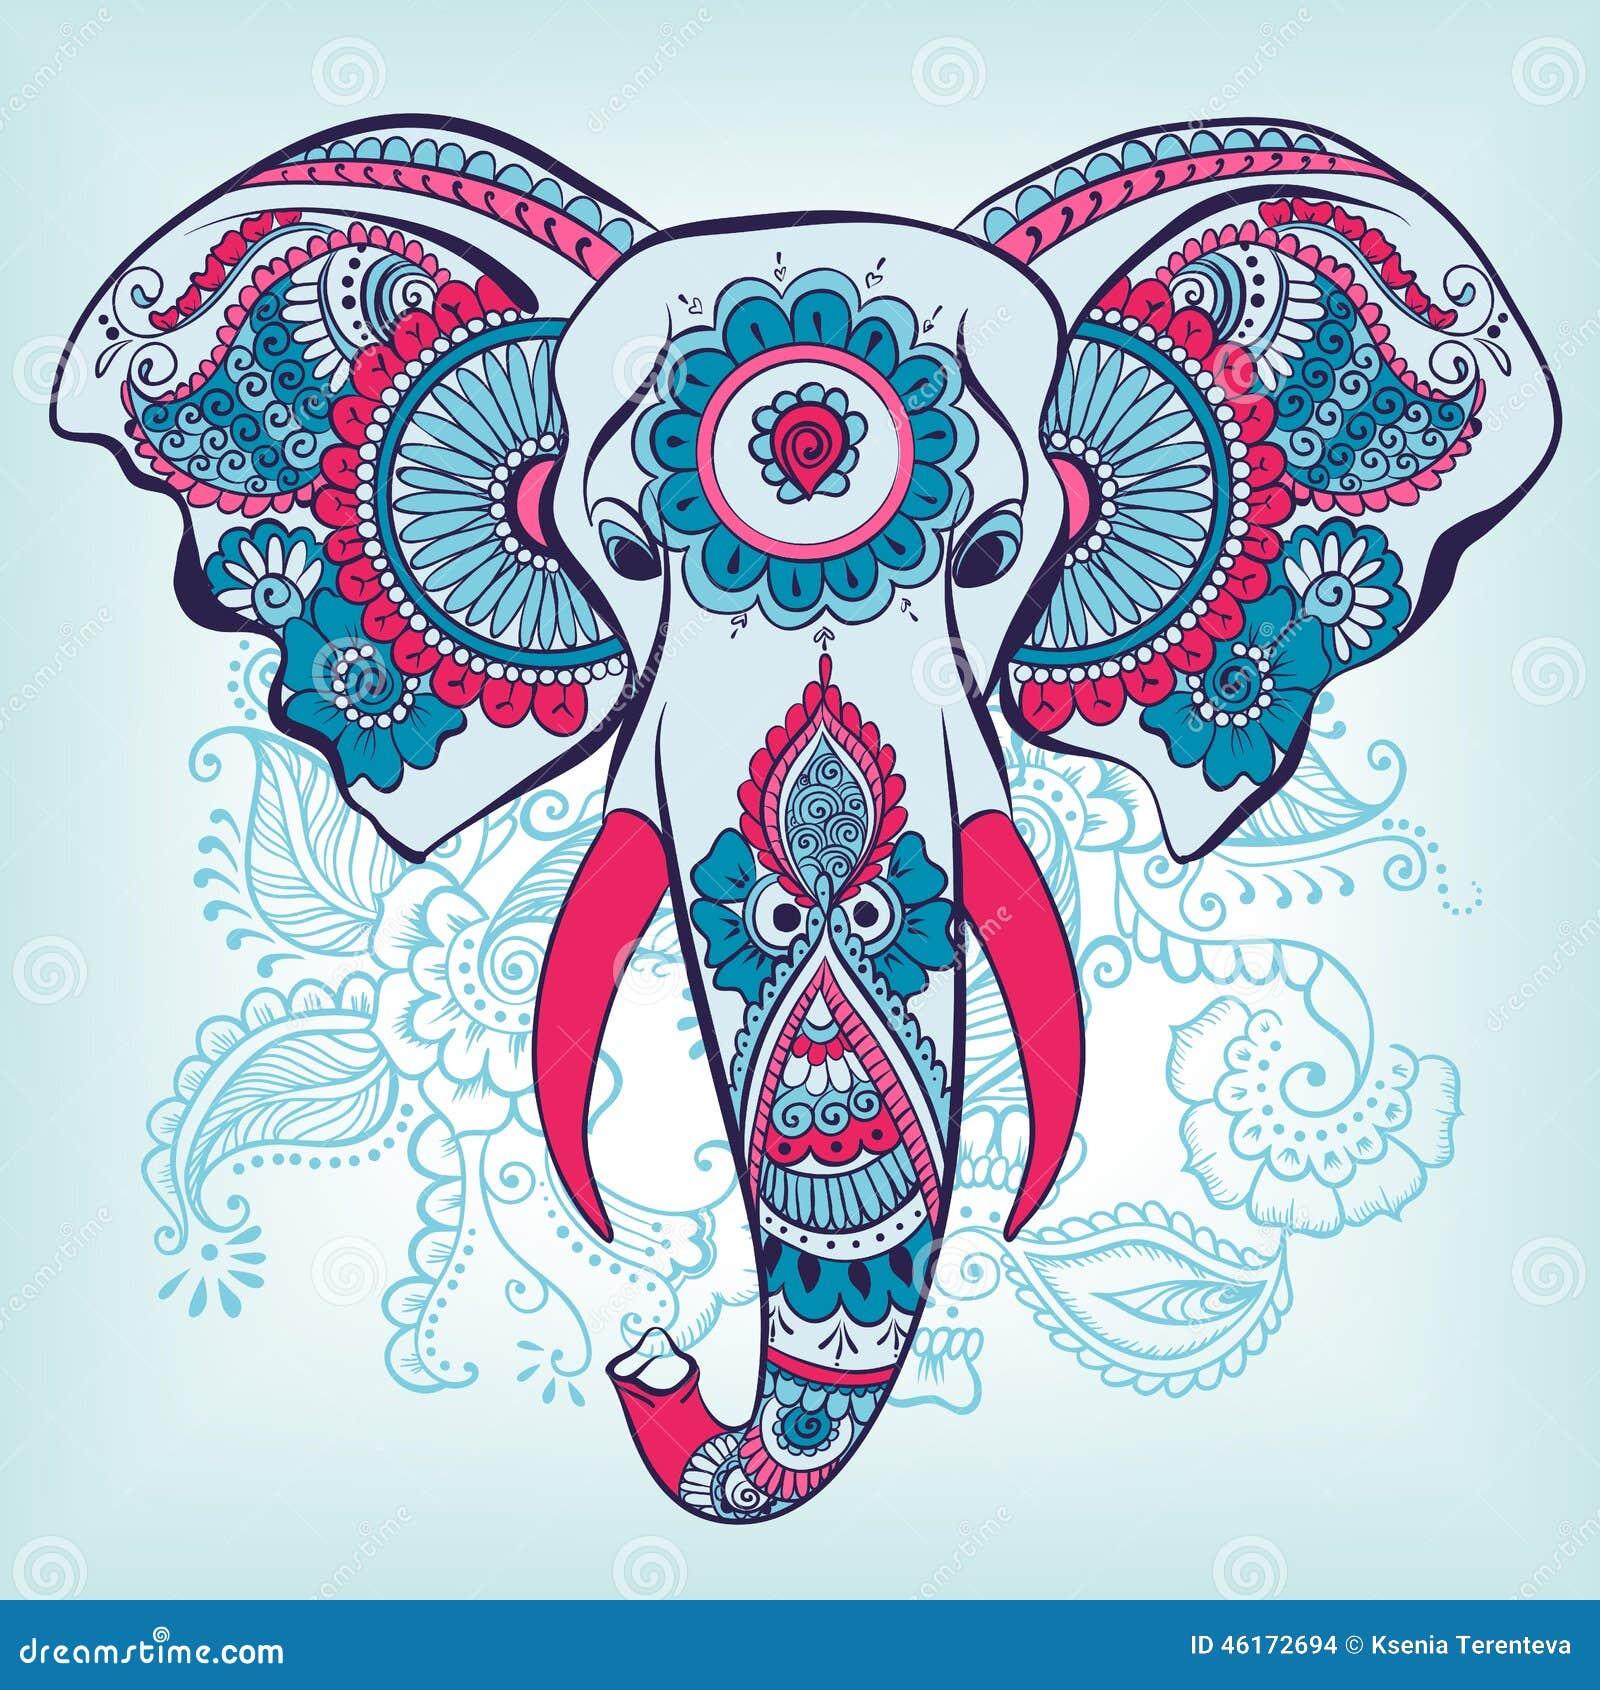 Mehndi Elephant Head : Vektor elefant auf henna indian ornament abbildung